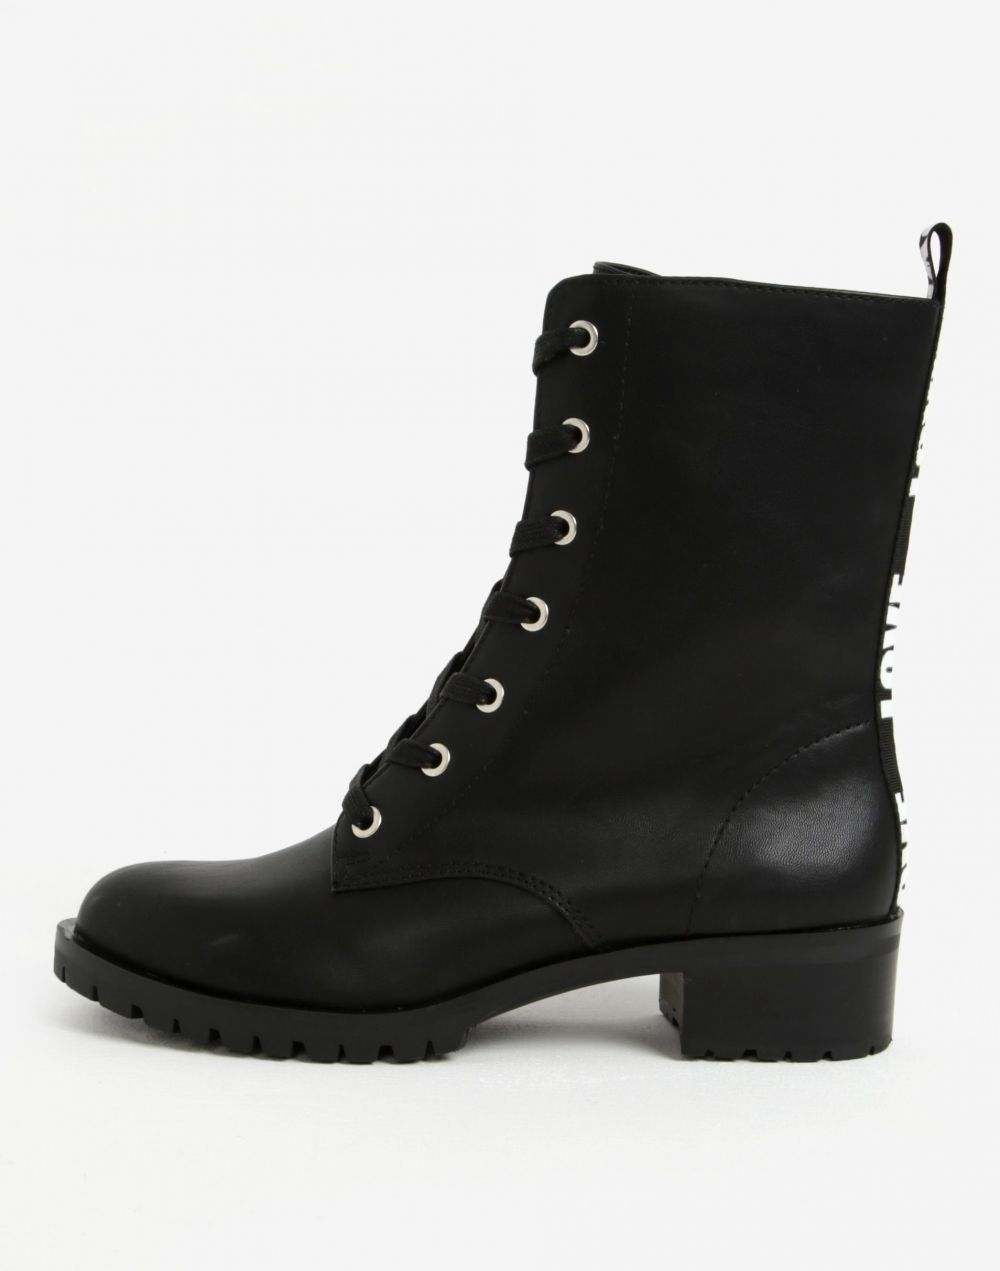 0095326415 Čierne členkové dámske topánky s potlačou na päte ALDO Trulle značky ALDO -  Lovely.sk